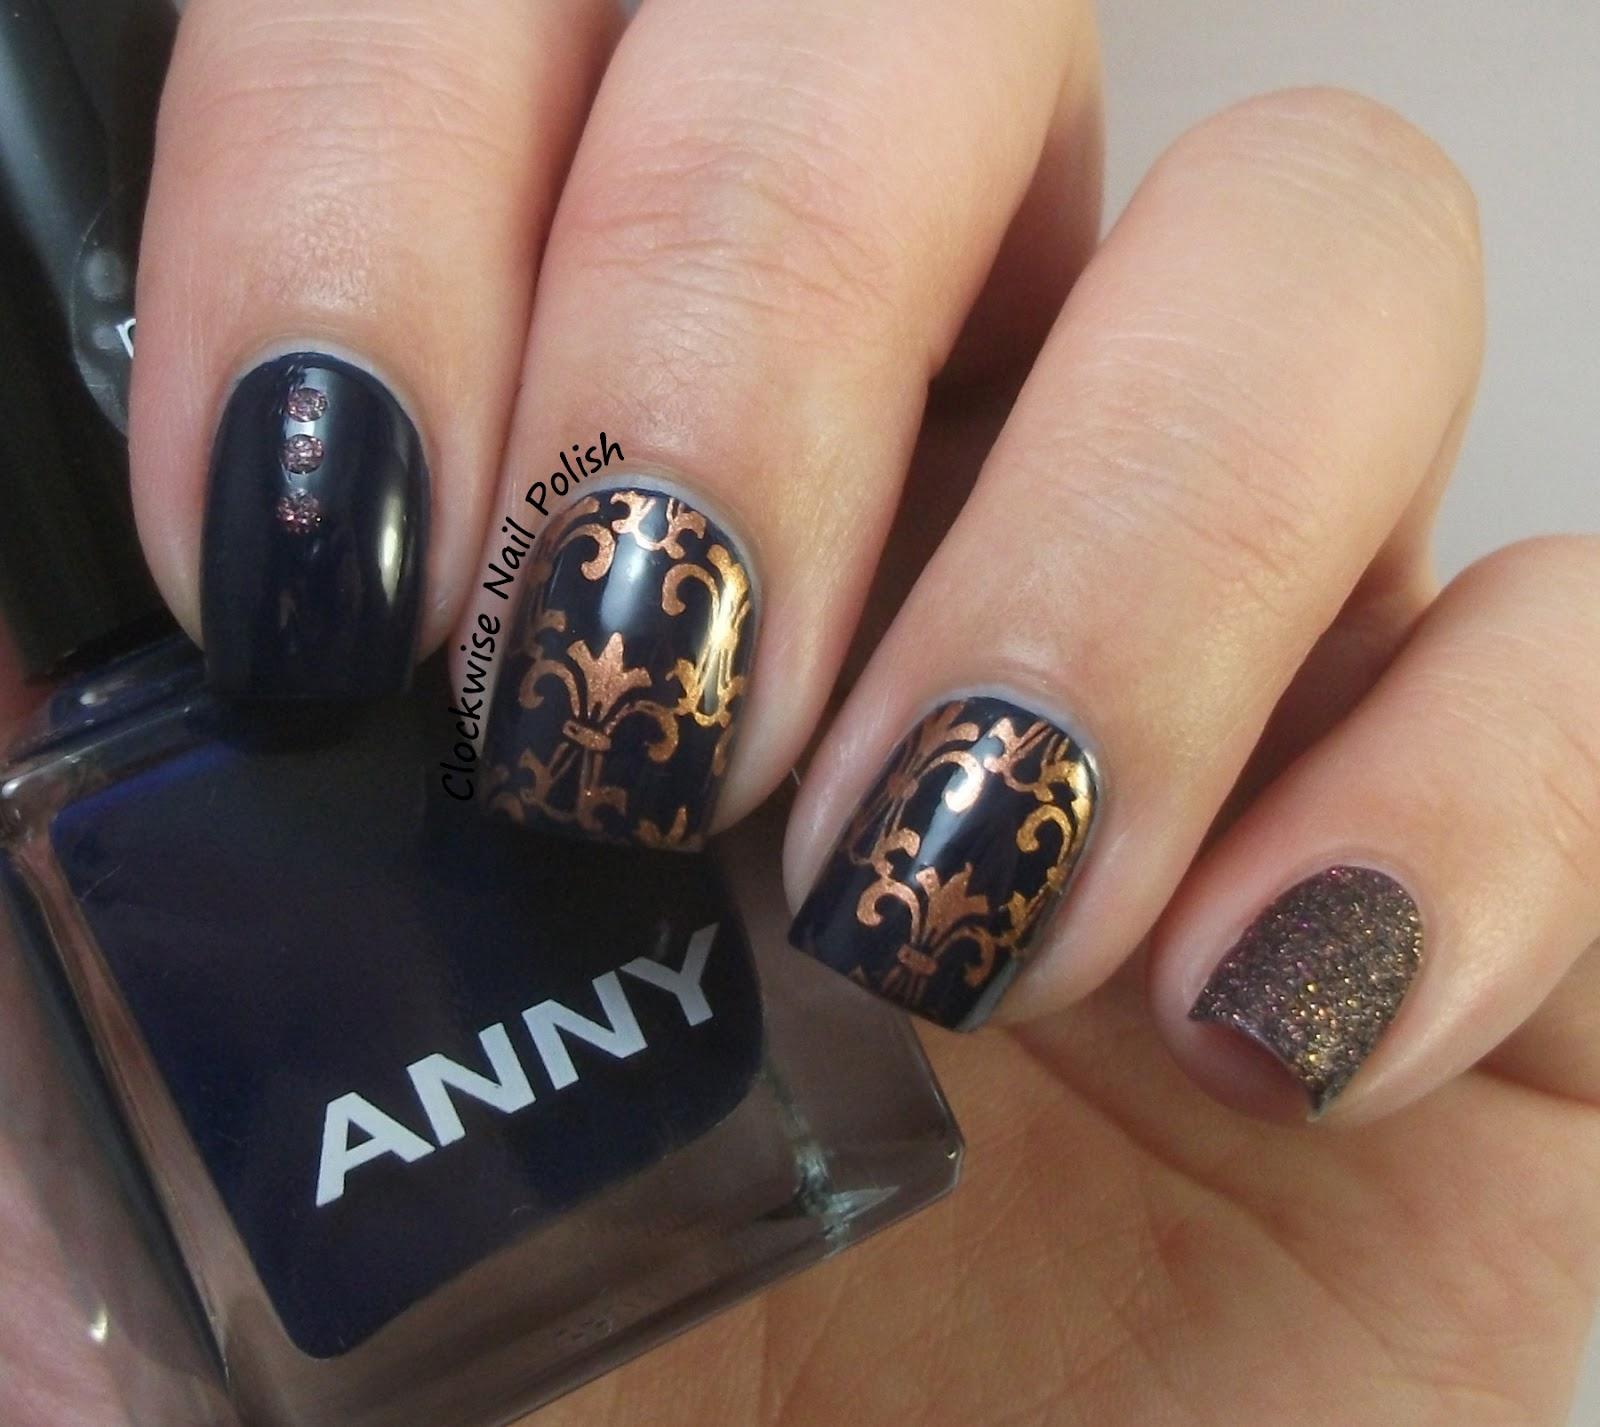 Nail Art Midnight Blue: The Clockwise Nail Polish: Anny Midnight Blue & Fleur De